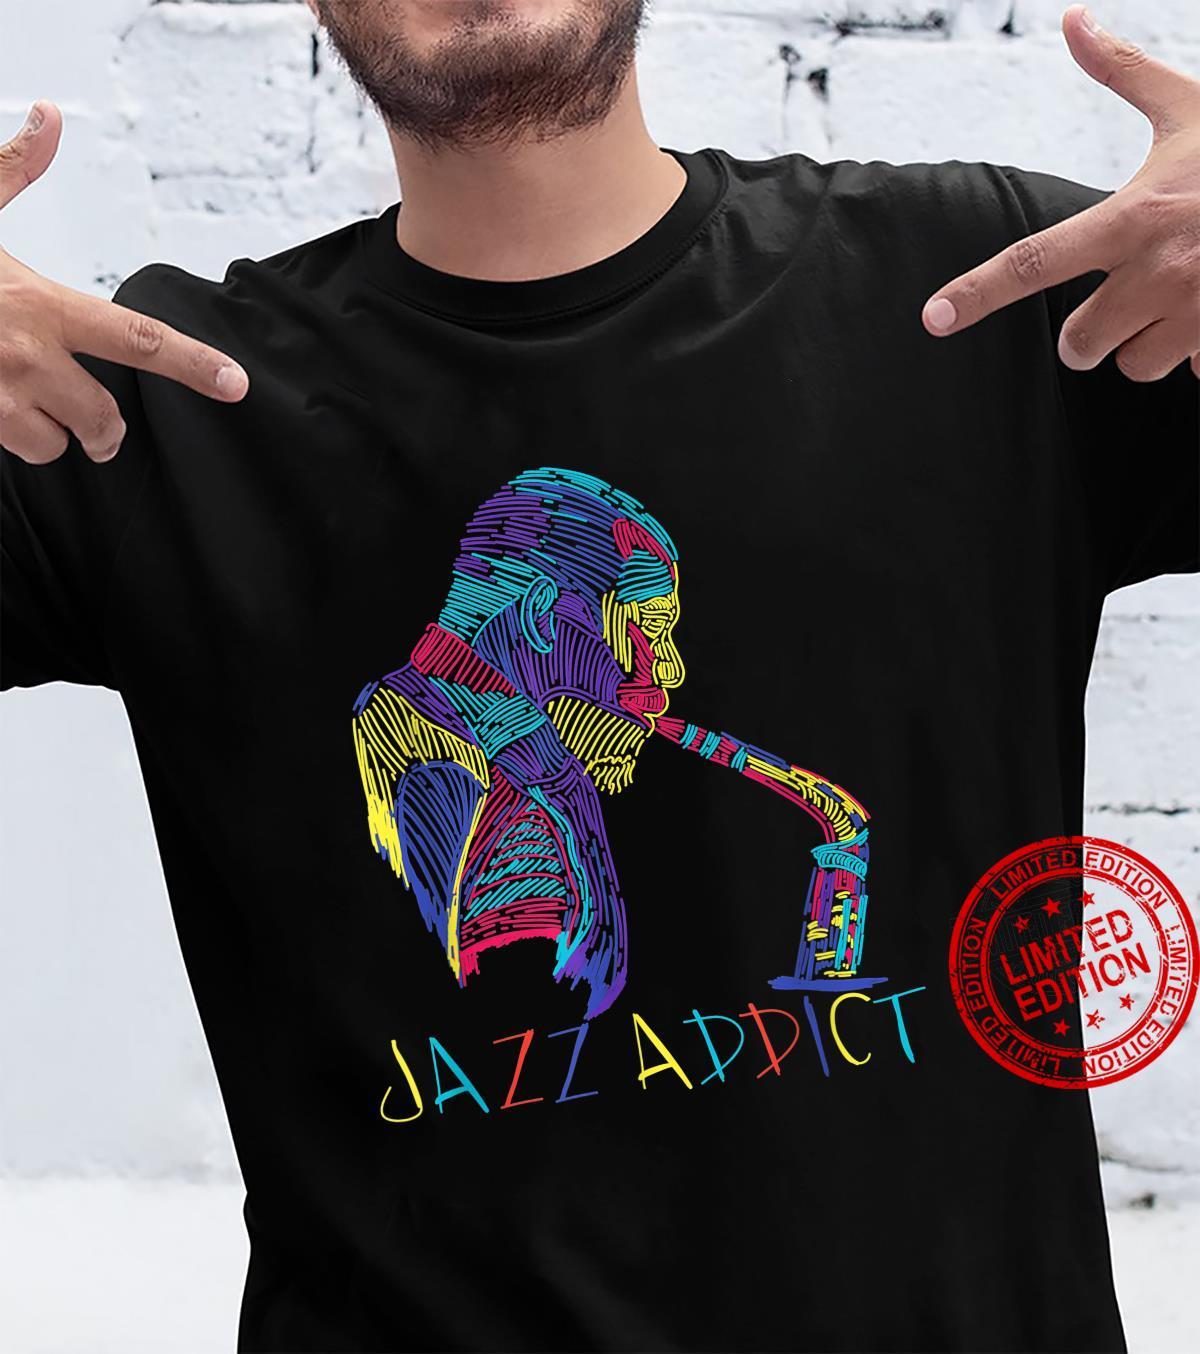 Funny Saxophone Jazz Addict Shirt